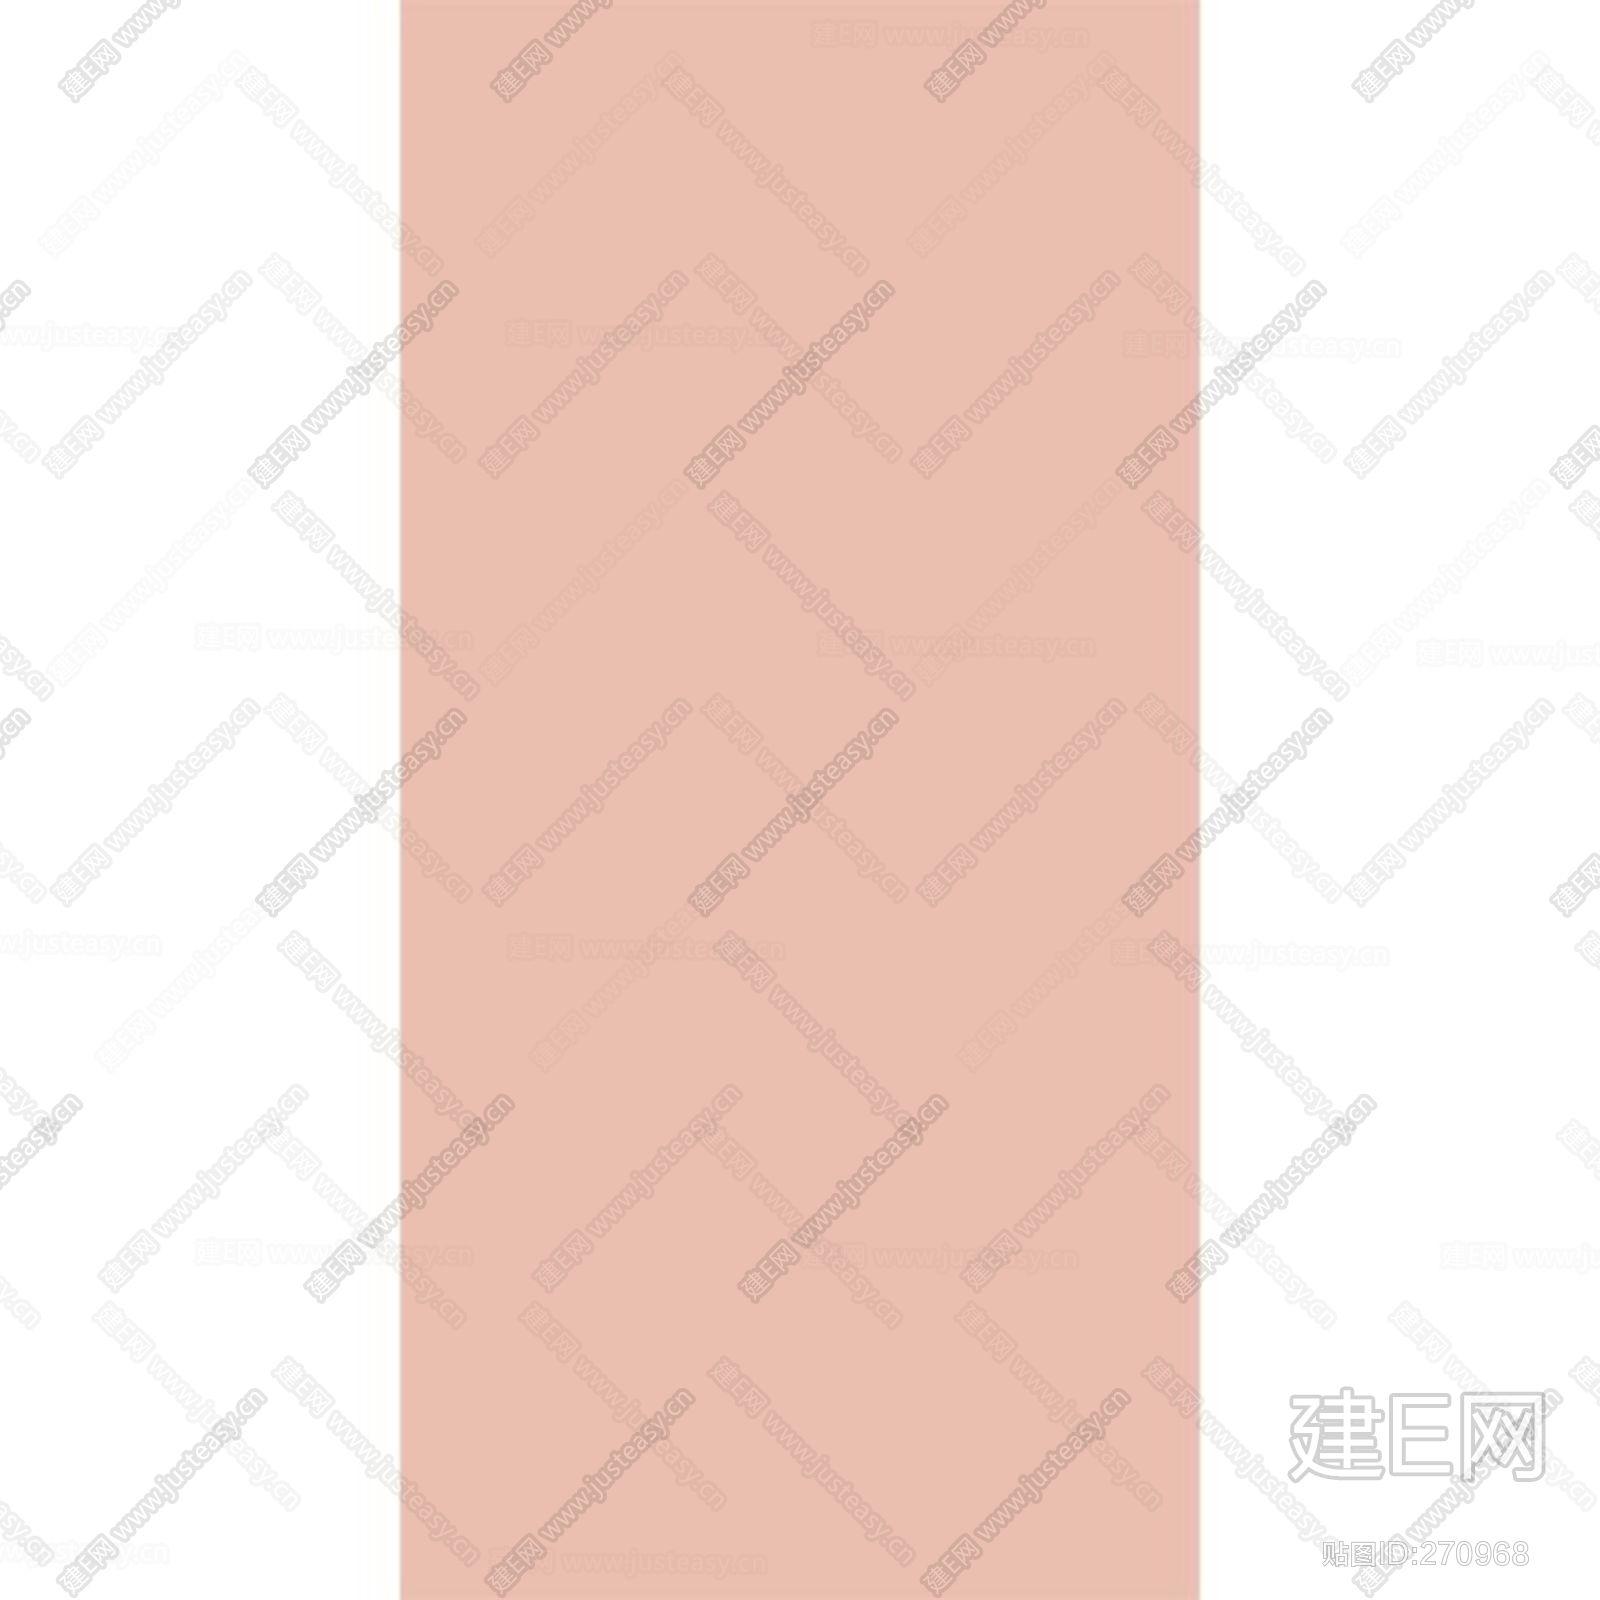 HMH-炫丽系列-YDH341莹粉贴图